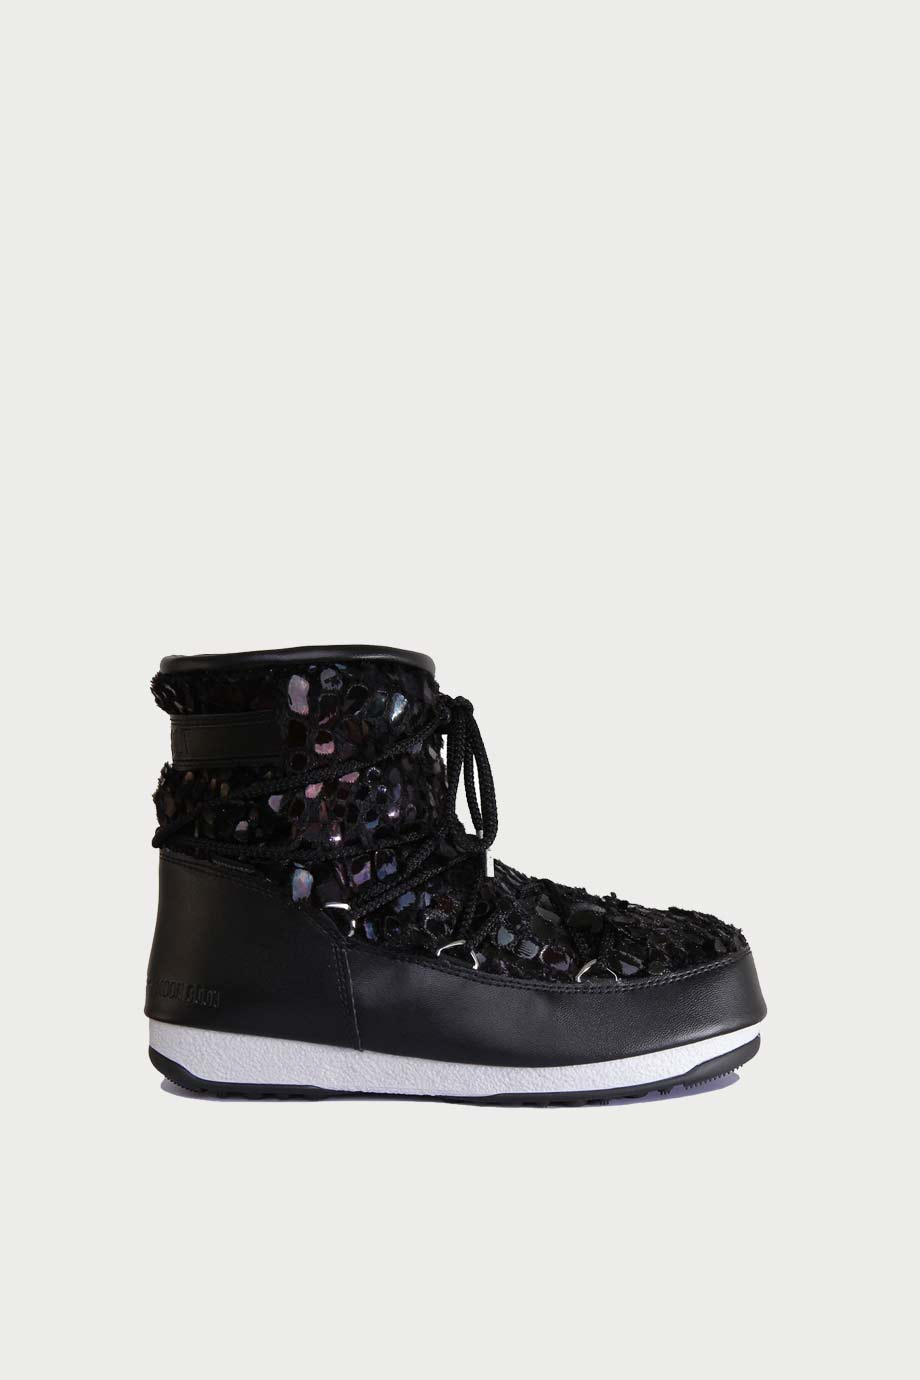 spiridoula metheniti shoes xalkida p 24007000 001 black stones low MoonBoot